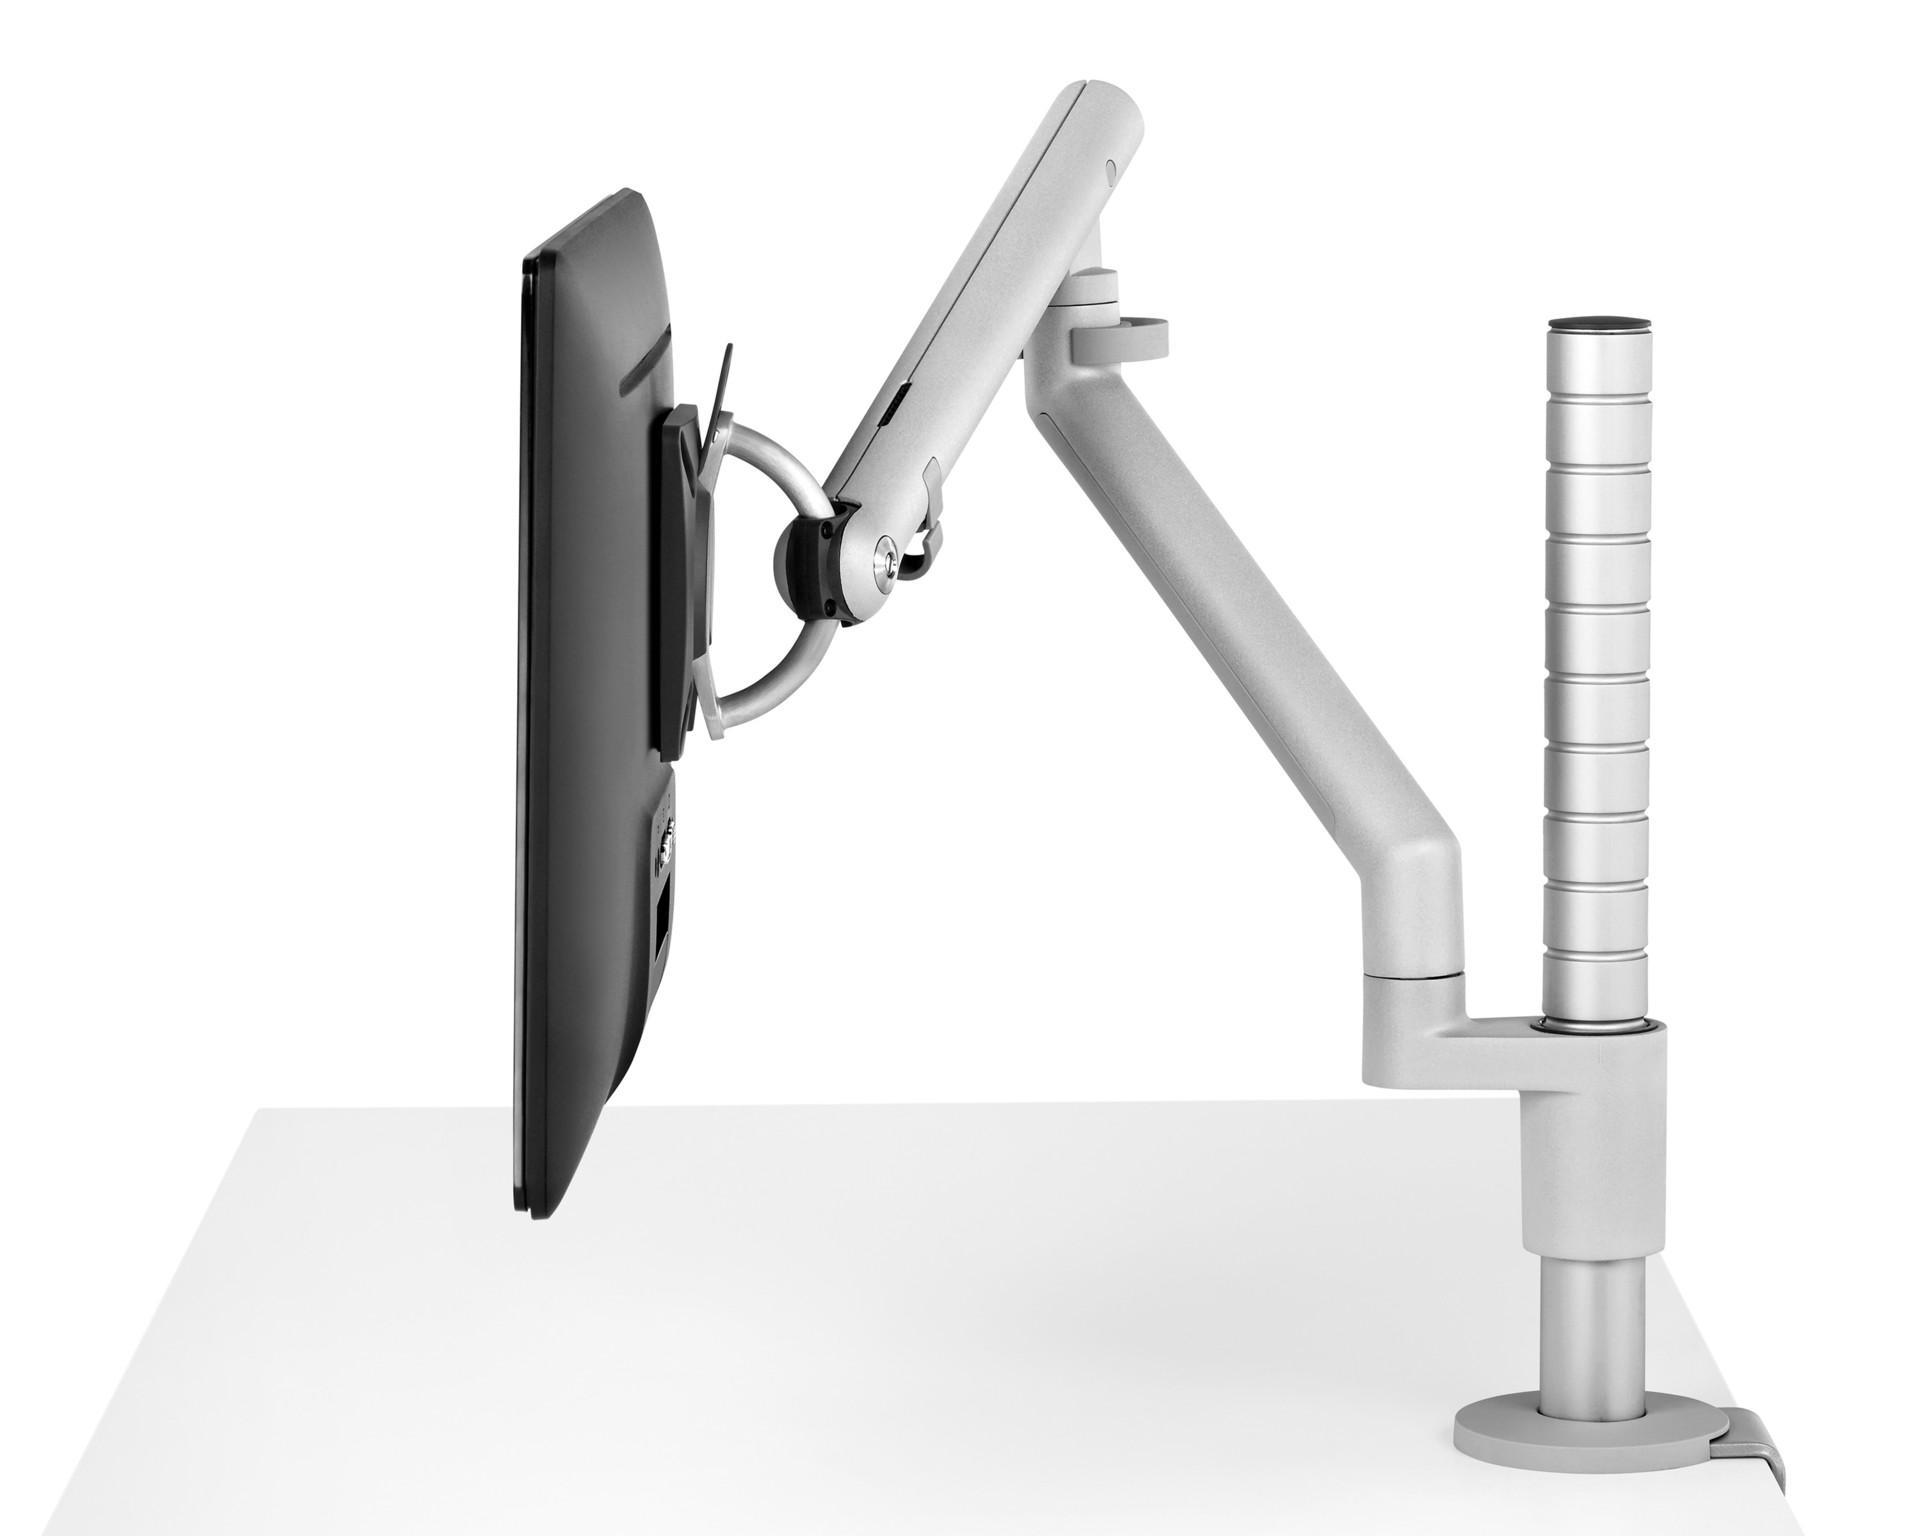 5-Equipamiento-Soporte-Monitor-Flo-Ergonomico-1920